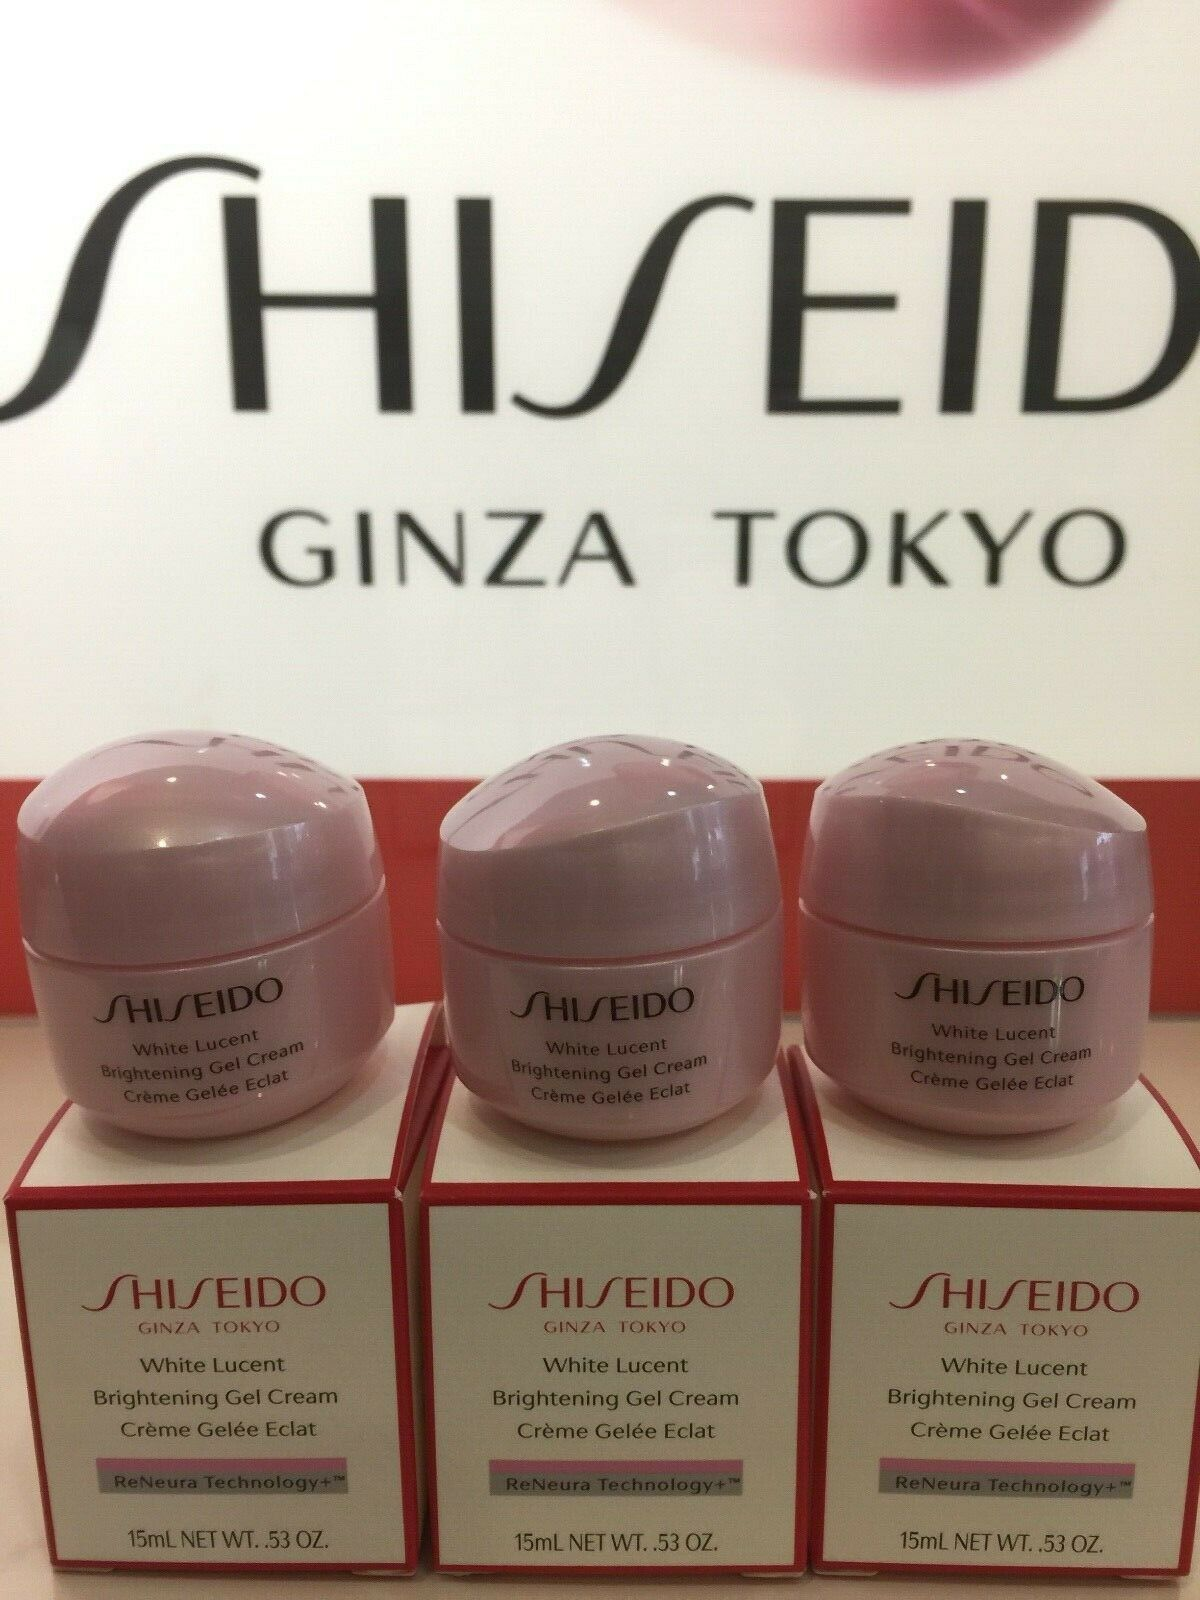 SHISEIDO White Lucent Brightening Gel Cream Size: 15 ml x 3